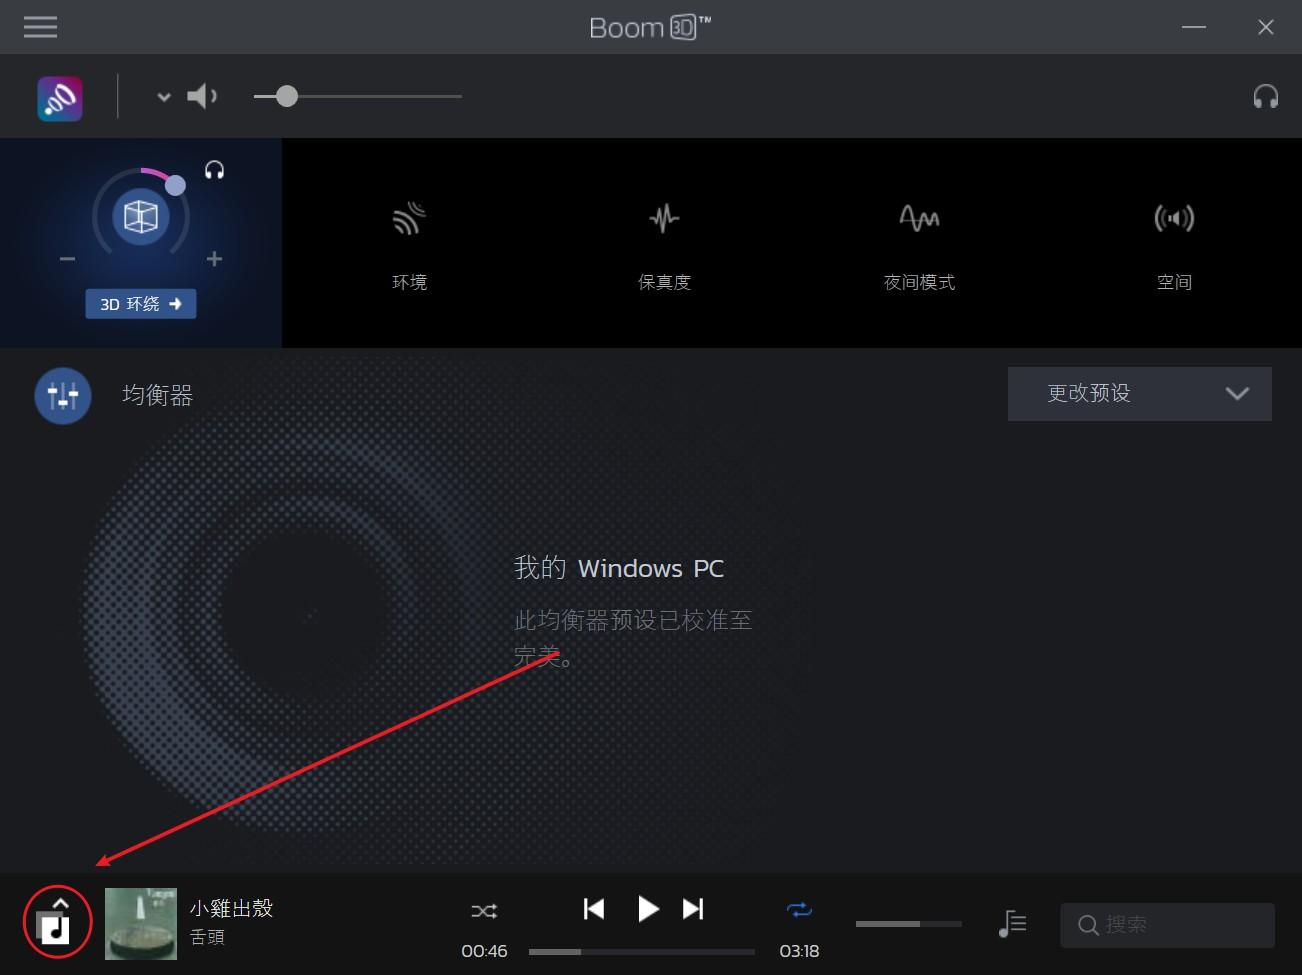 Boom 3D主界面展示